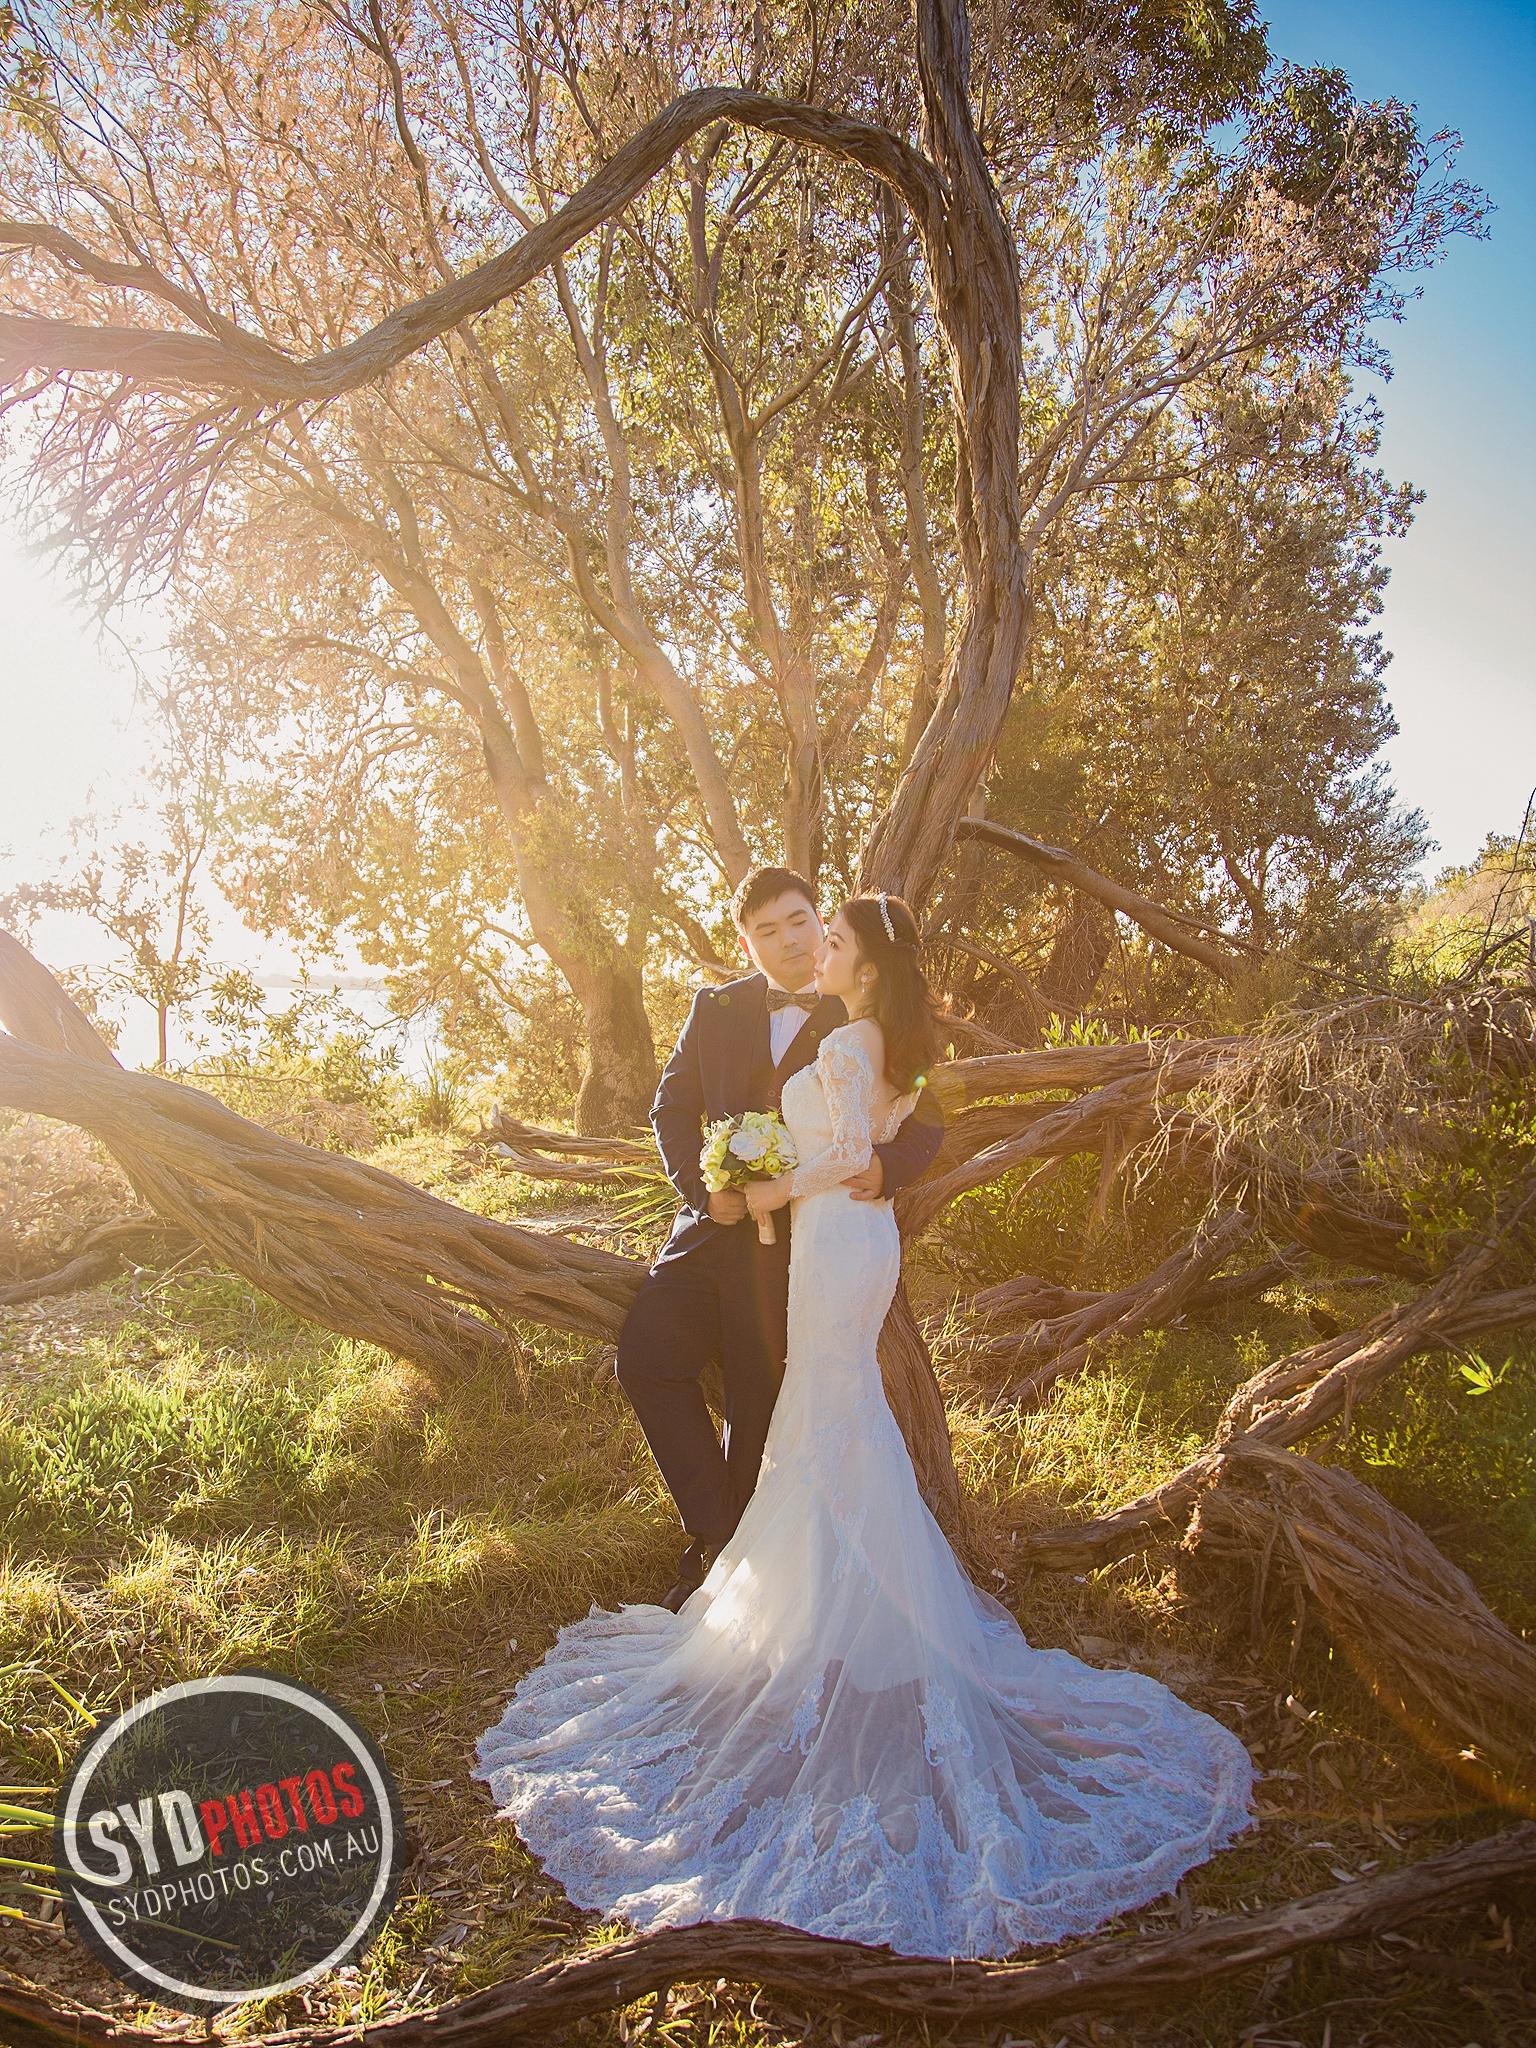 ID-111515-Chloe-Prewedding-悉尼婚纱摄影